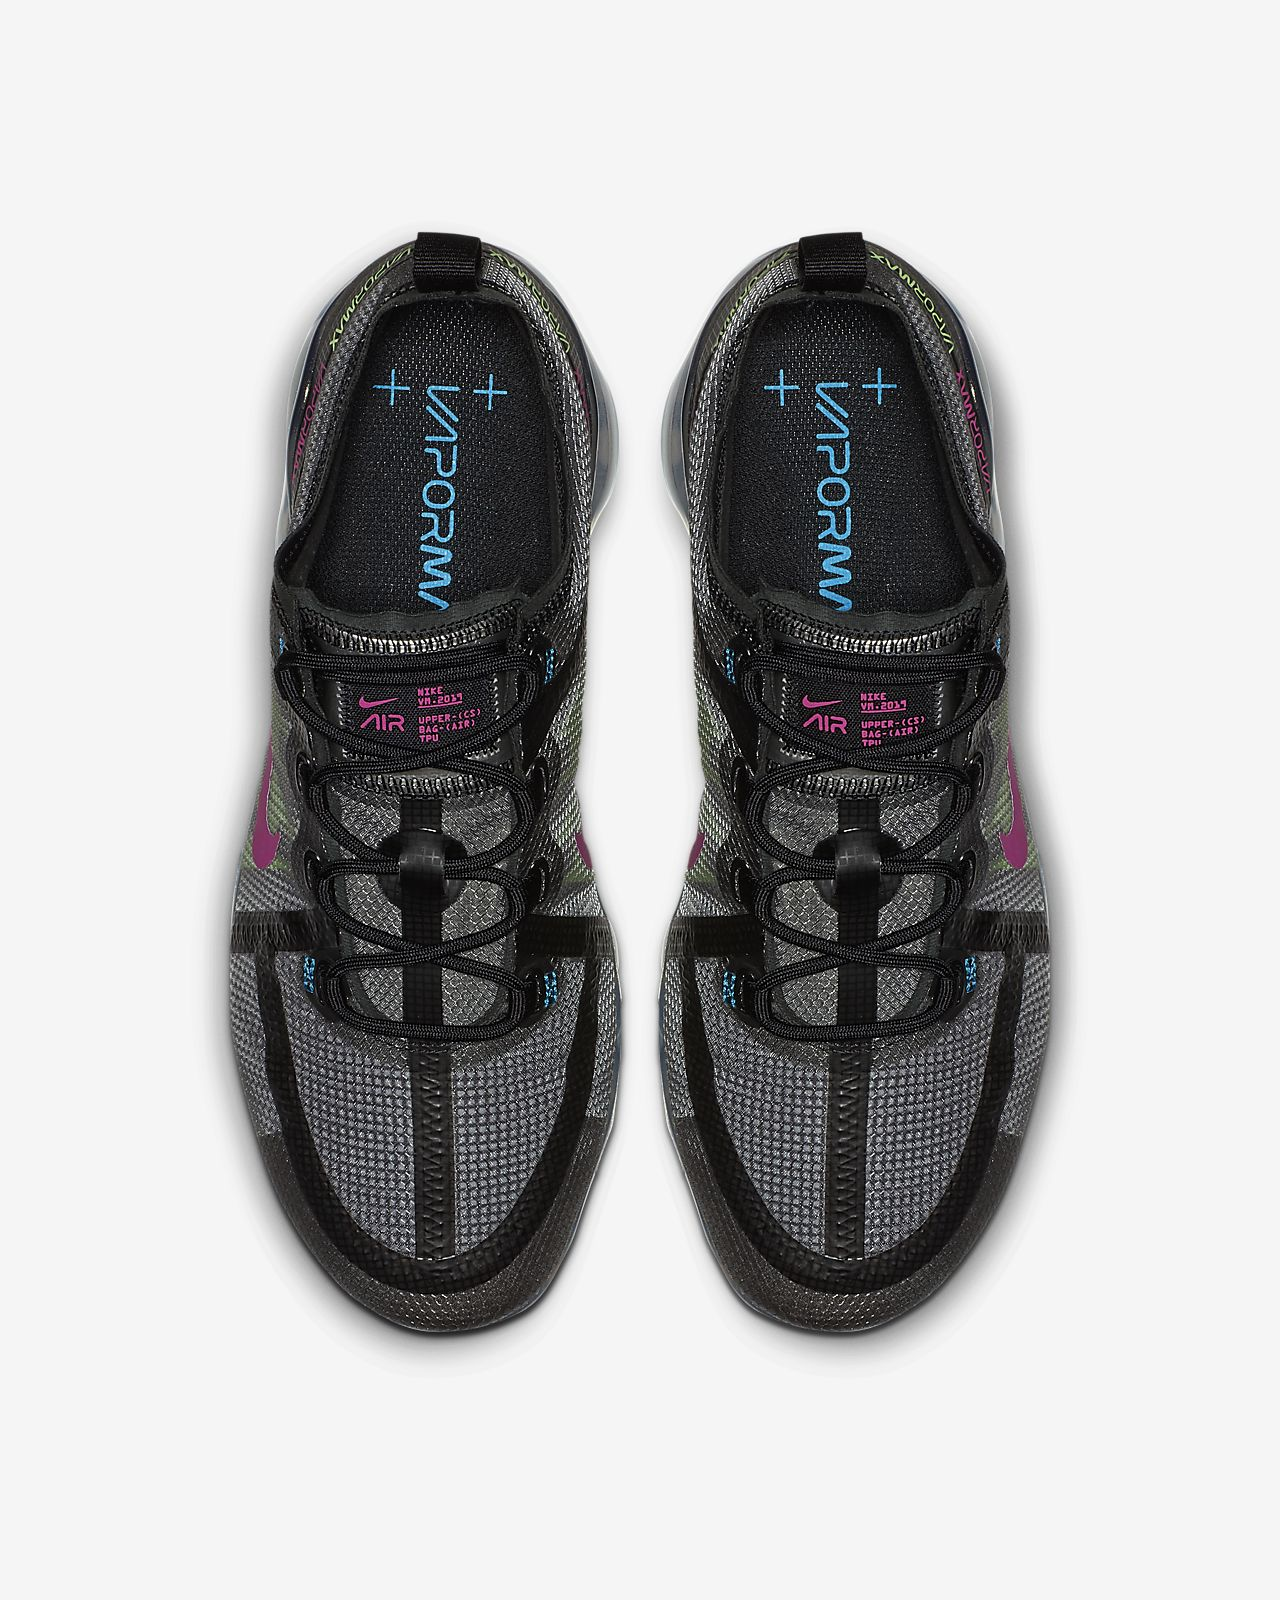 a0ebddc7d07 Nike Air VaporMax 2019 Premium Shoe. Nike.com VN